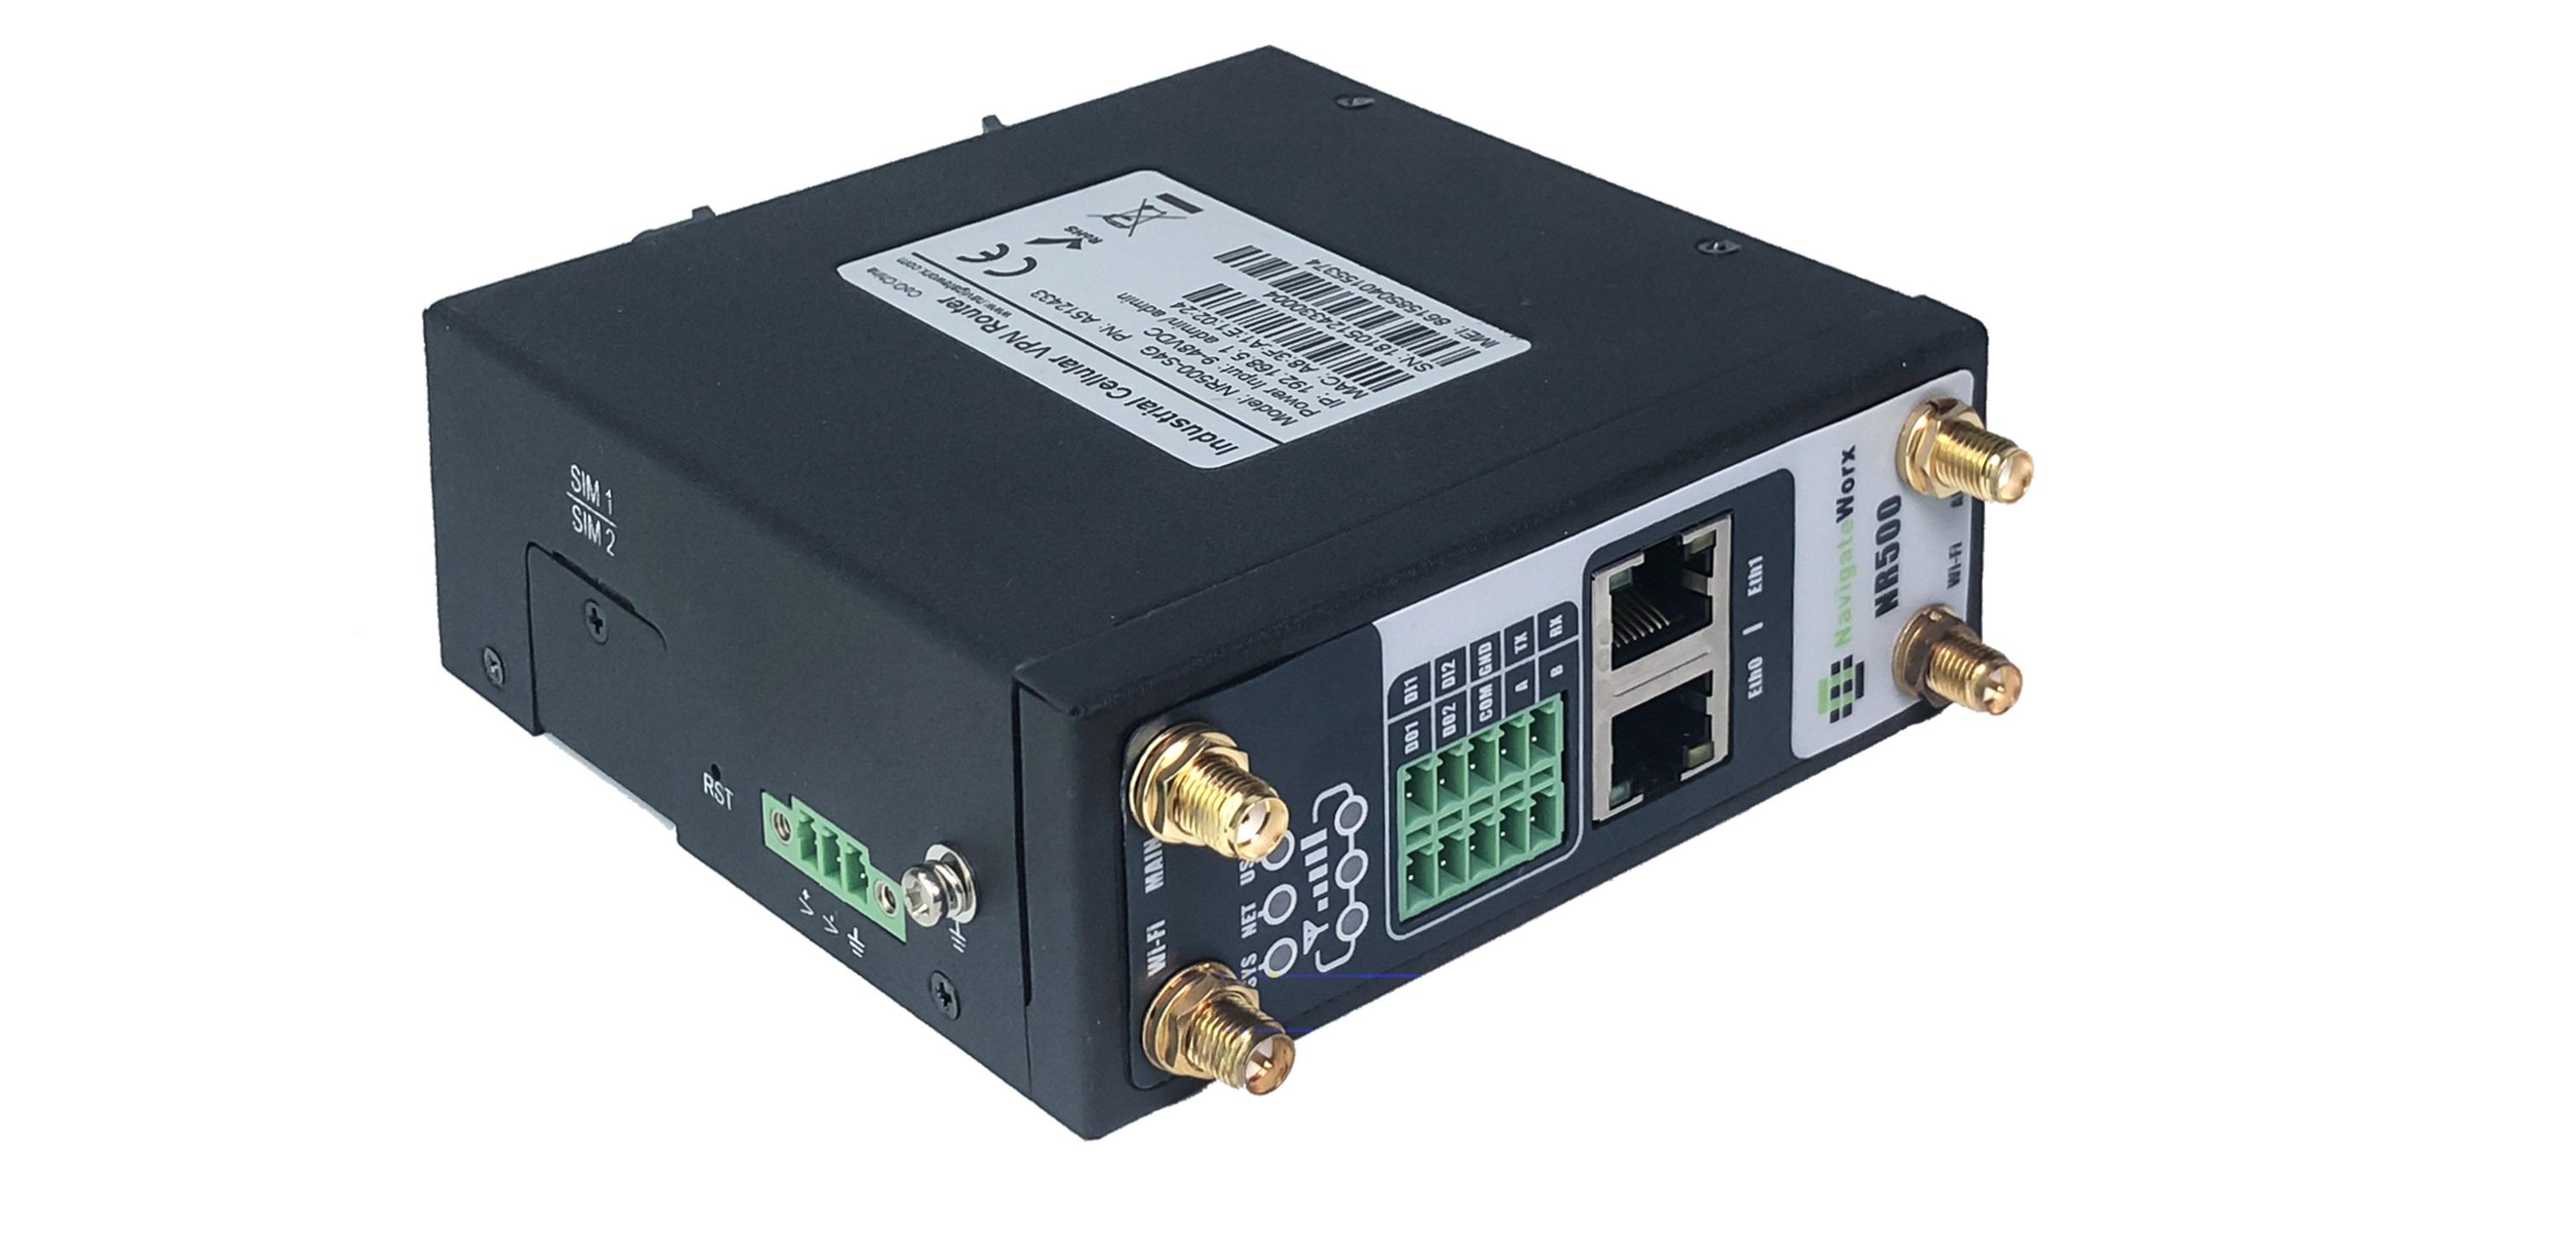 NR500 Standard industriële 4G router